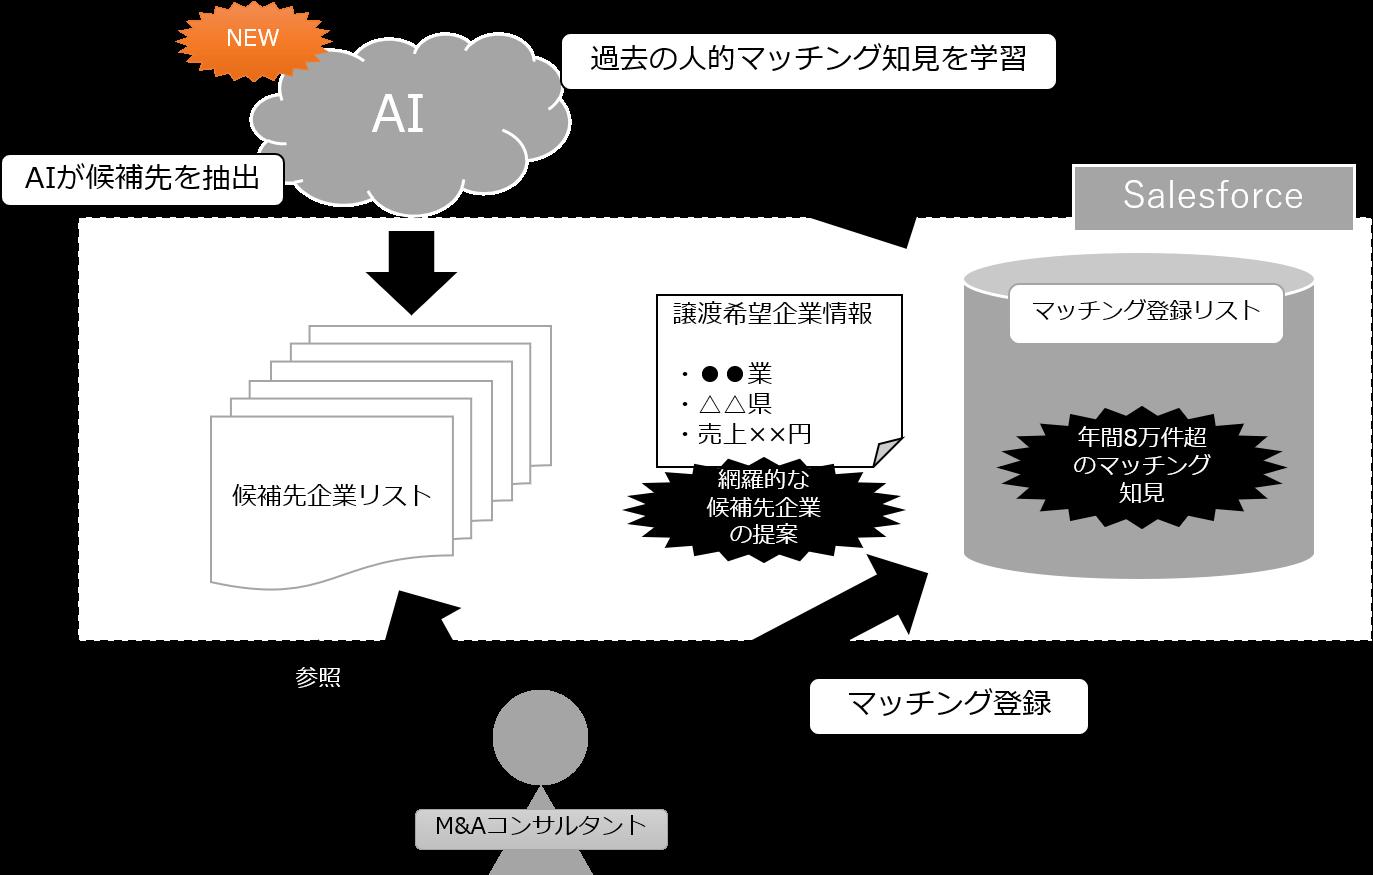 M&A初期マッチング活動へのAI導入イメージ